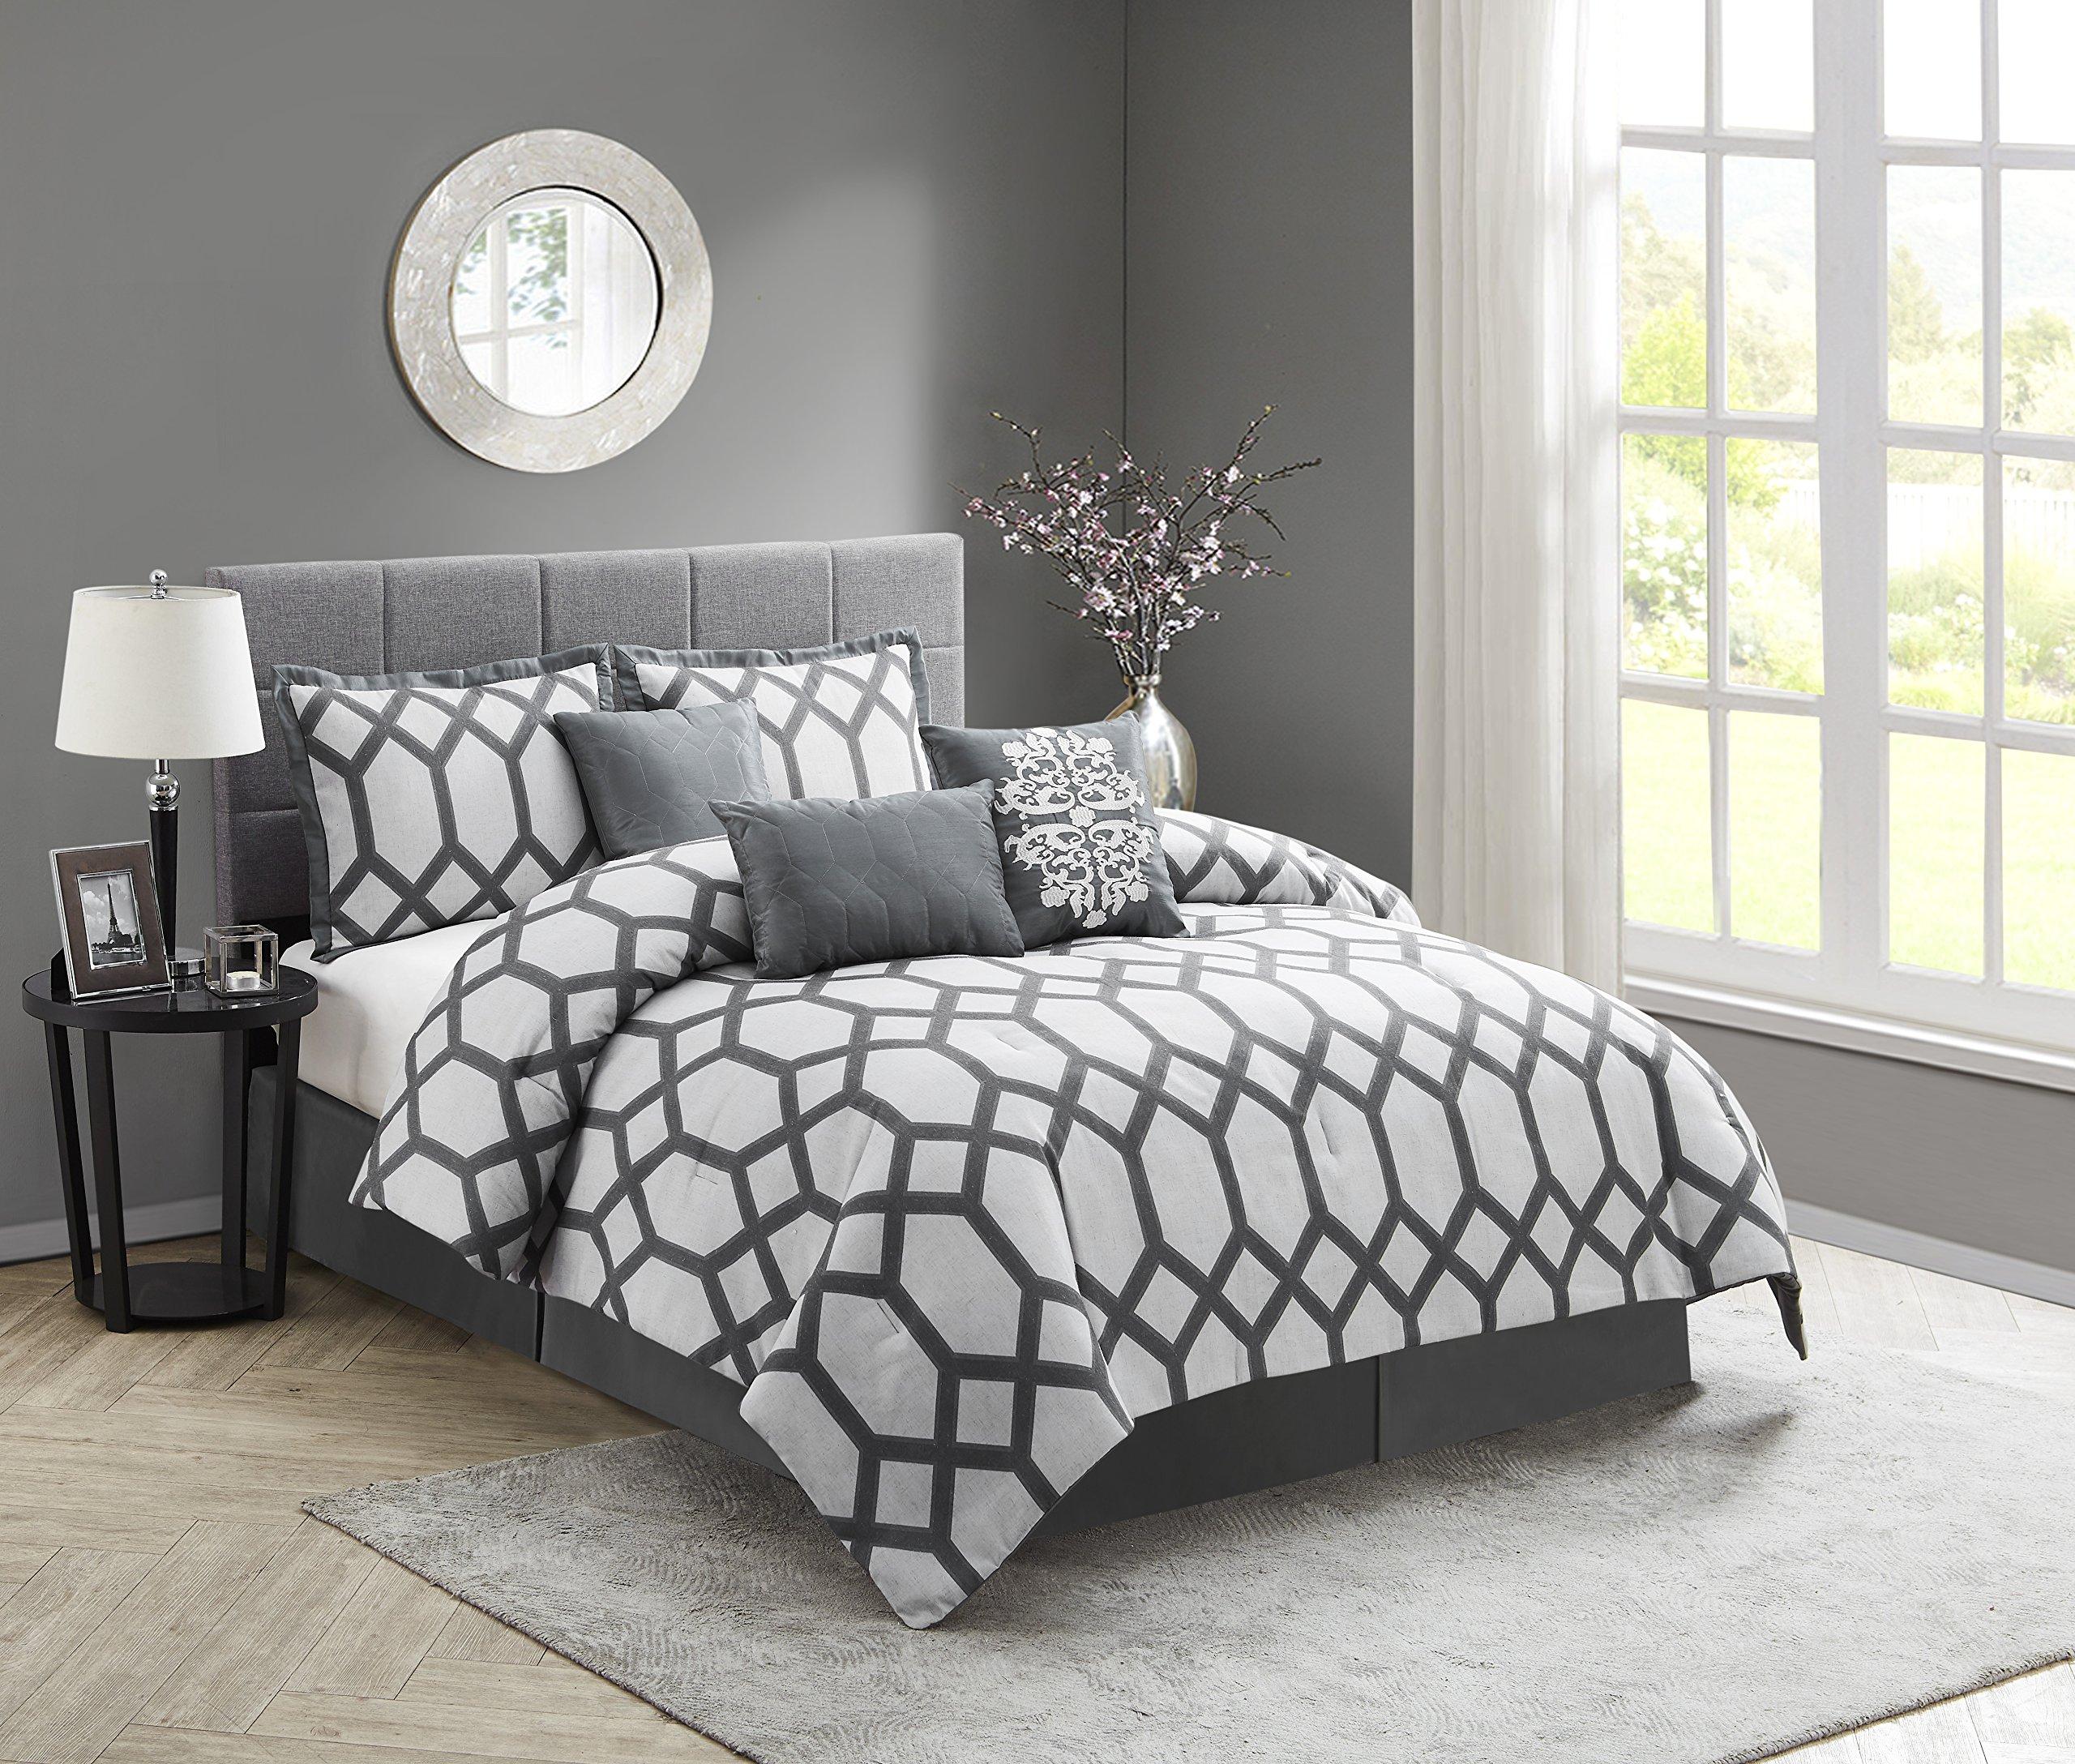 Nanshing America Nadia 7 Pc Comforter Set, California King, Gray